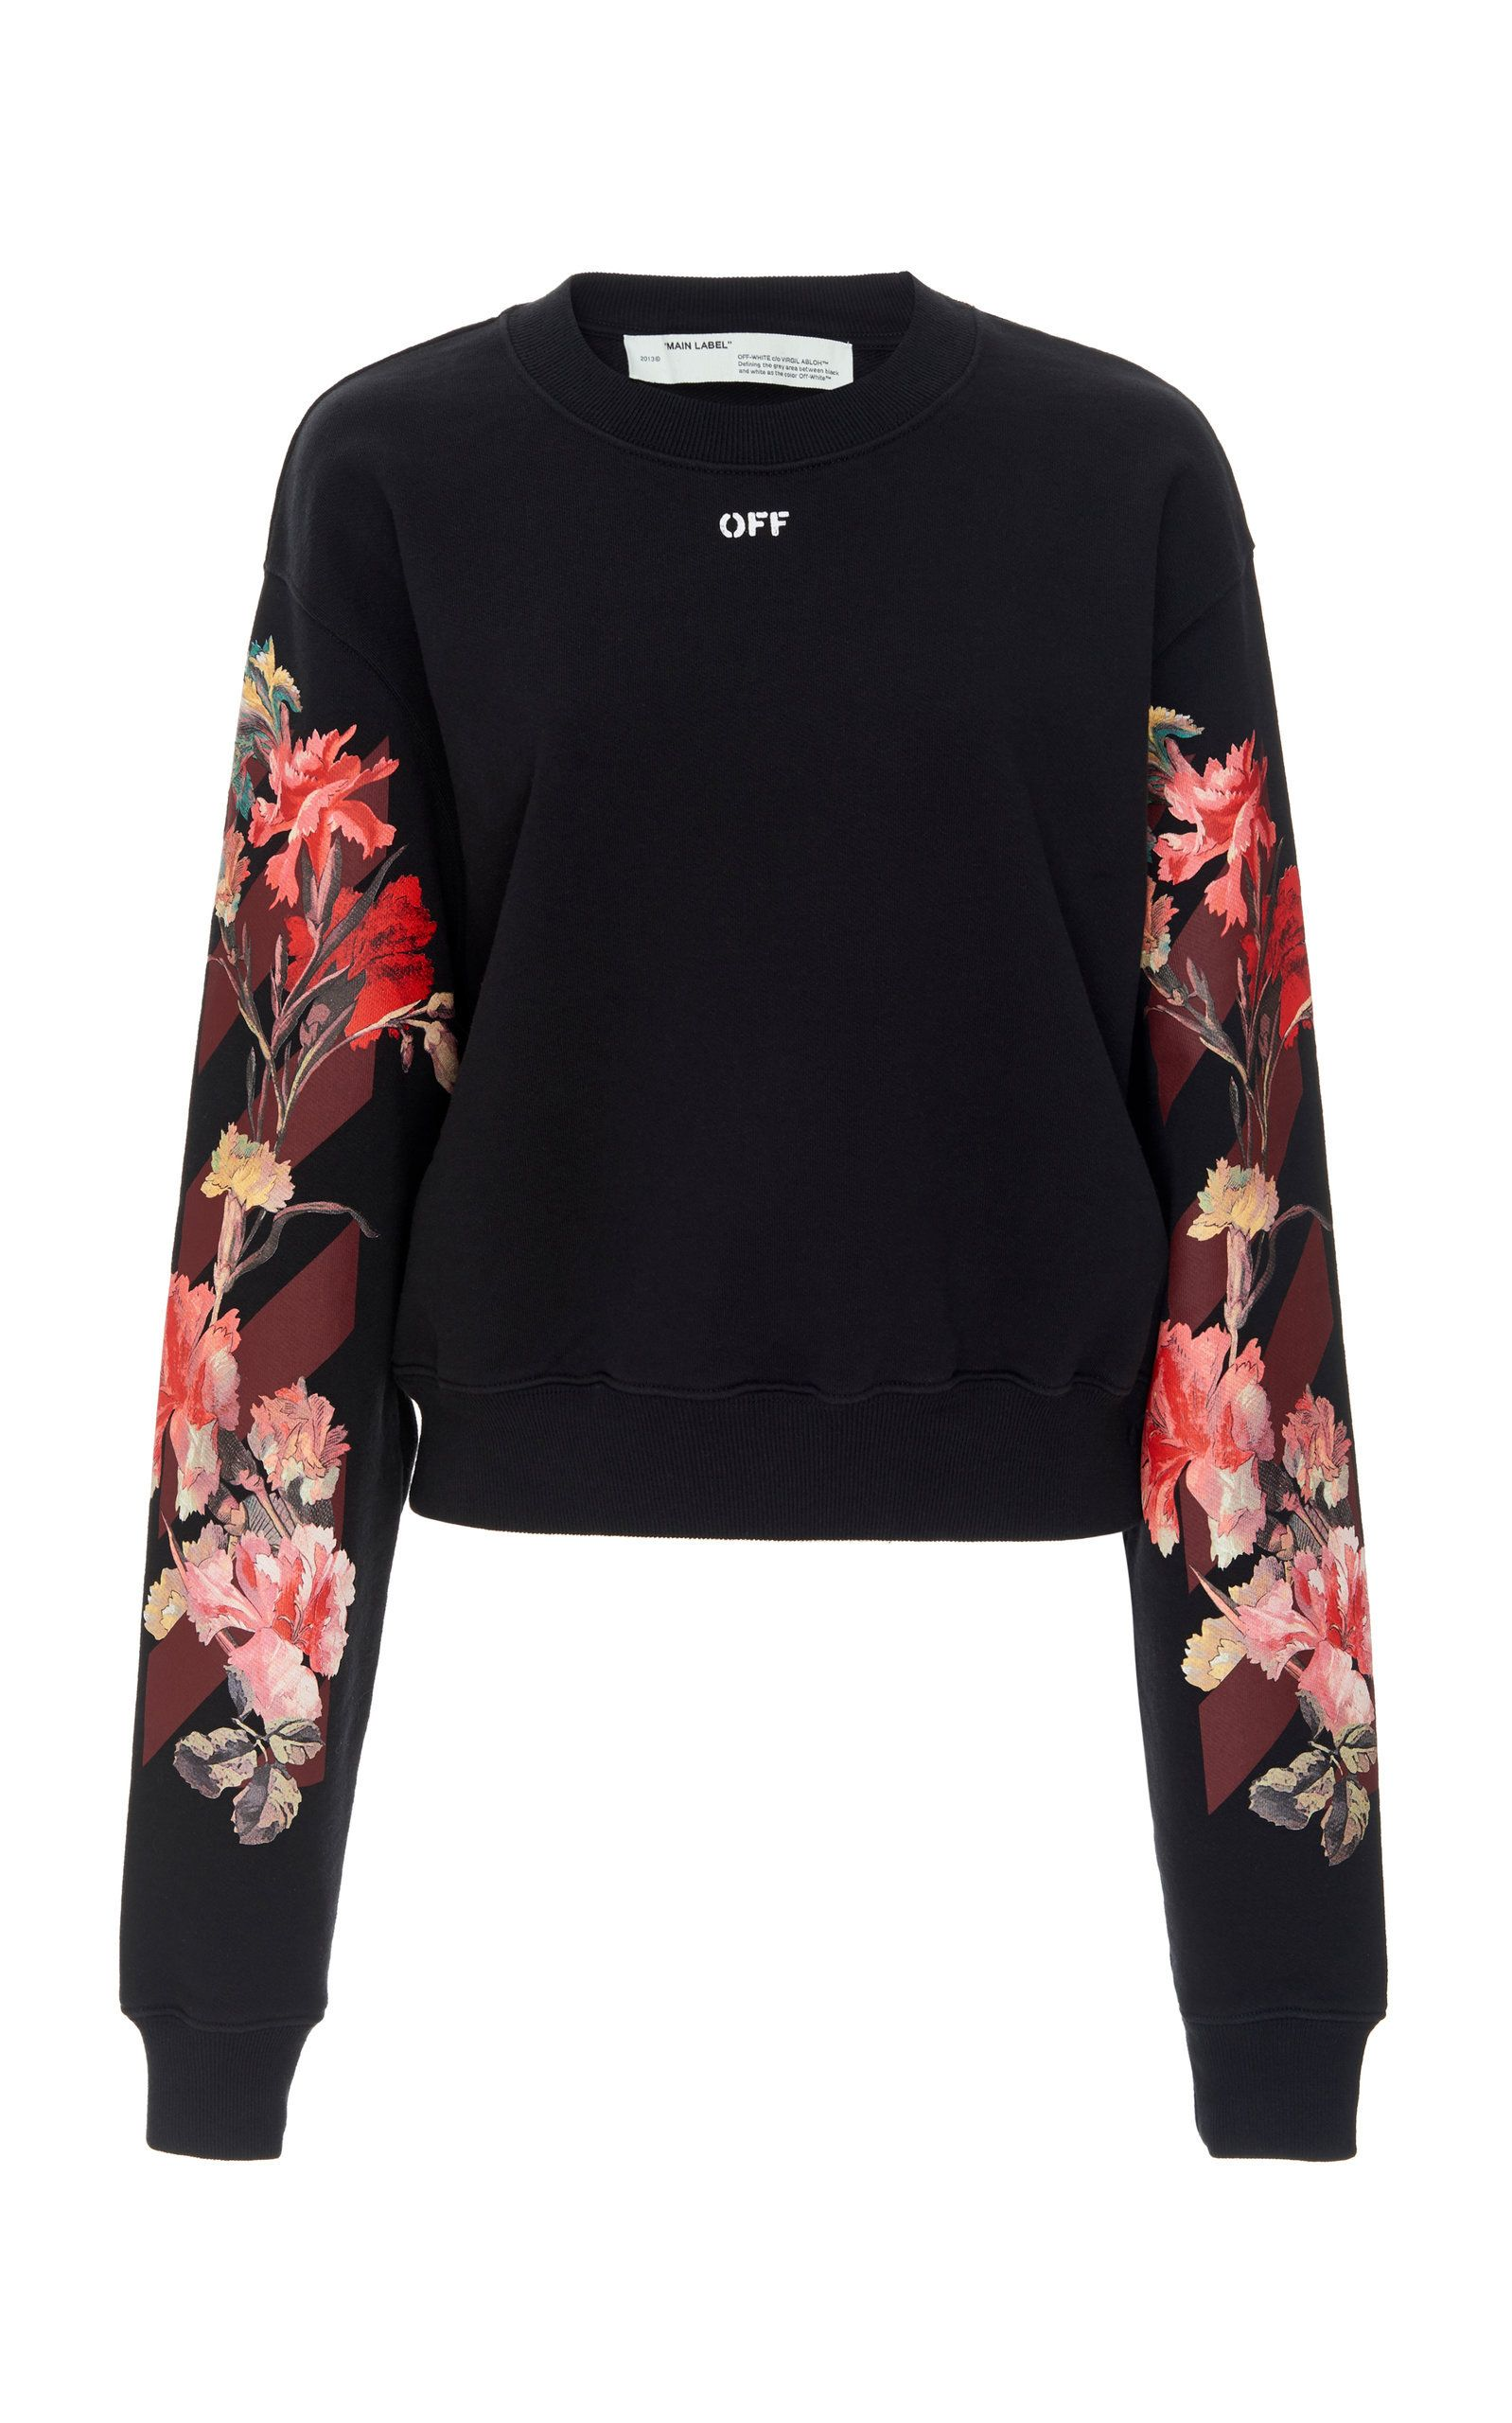 Flower Cotton Crop Crewneck By Off White C O Virgil Abloh For Preorder On Moda Operandi Off White Sweatshirt Crop Crewneck Sweatshirts [ 2560 x 1598 Pixel ]